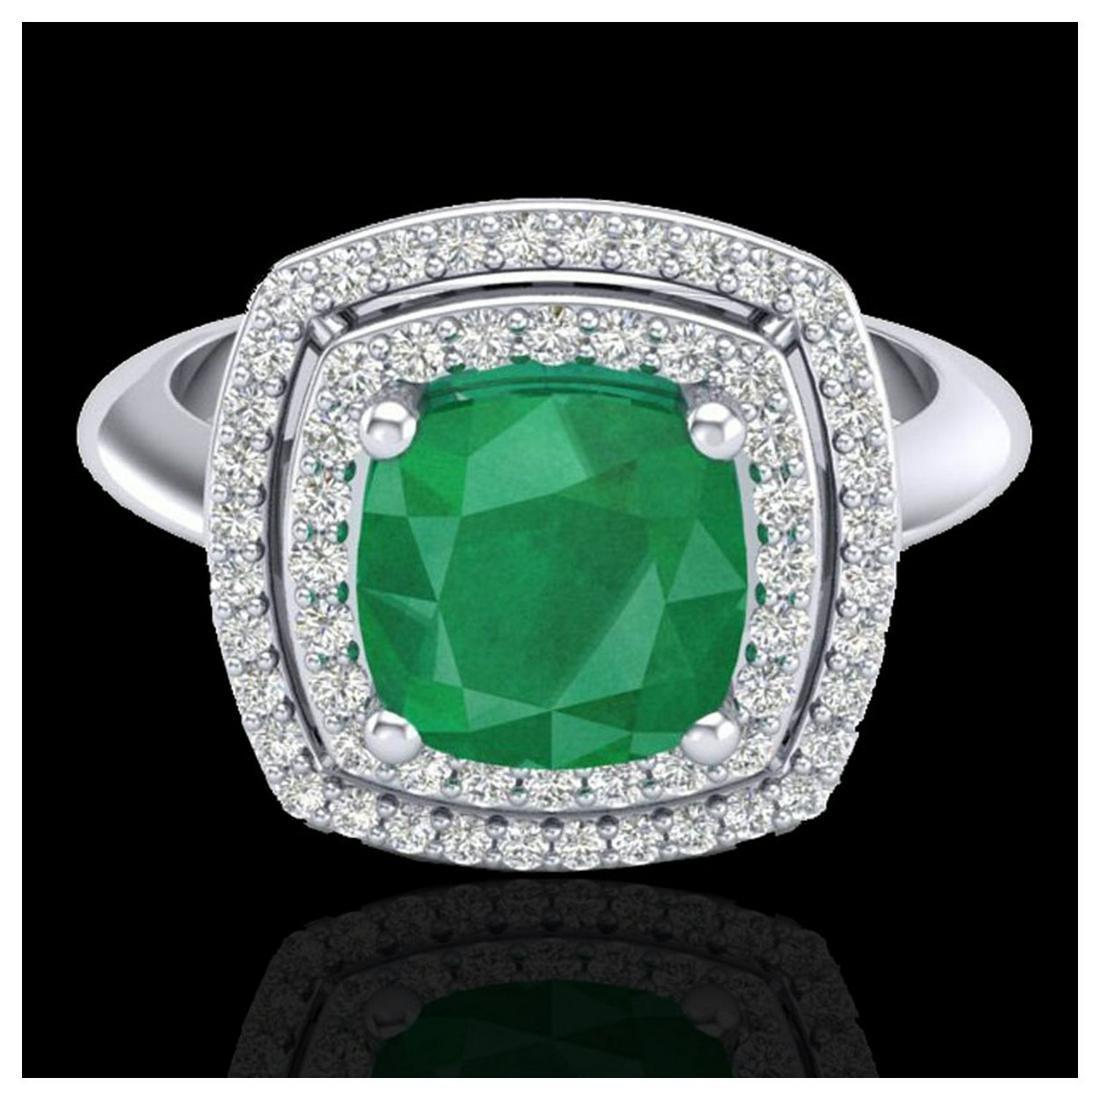 2.52 ctw Emerald & VS/SI Diamond Ring 18K White Gold -